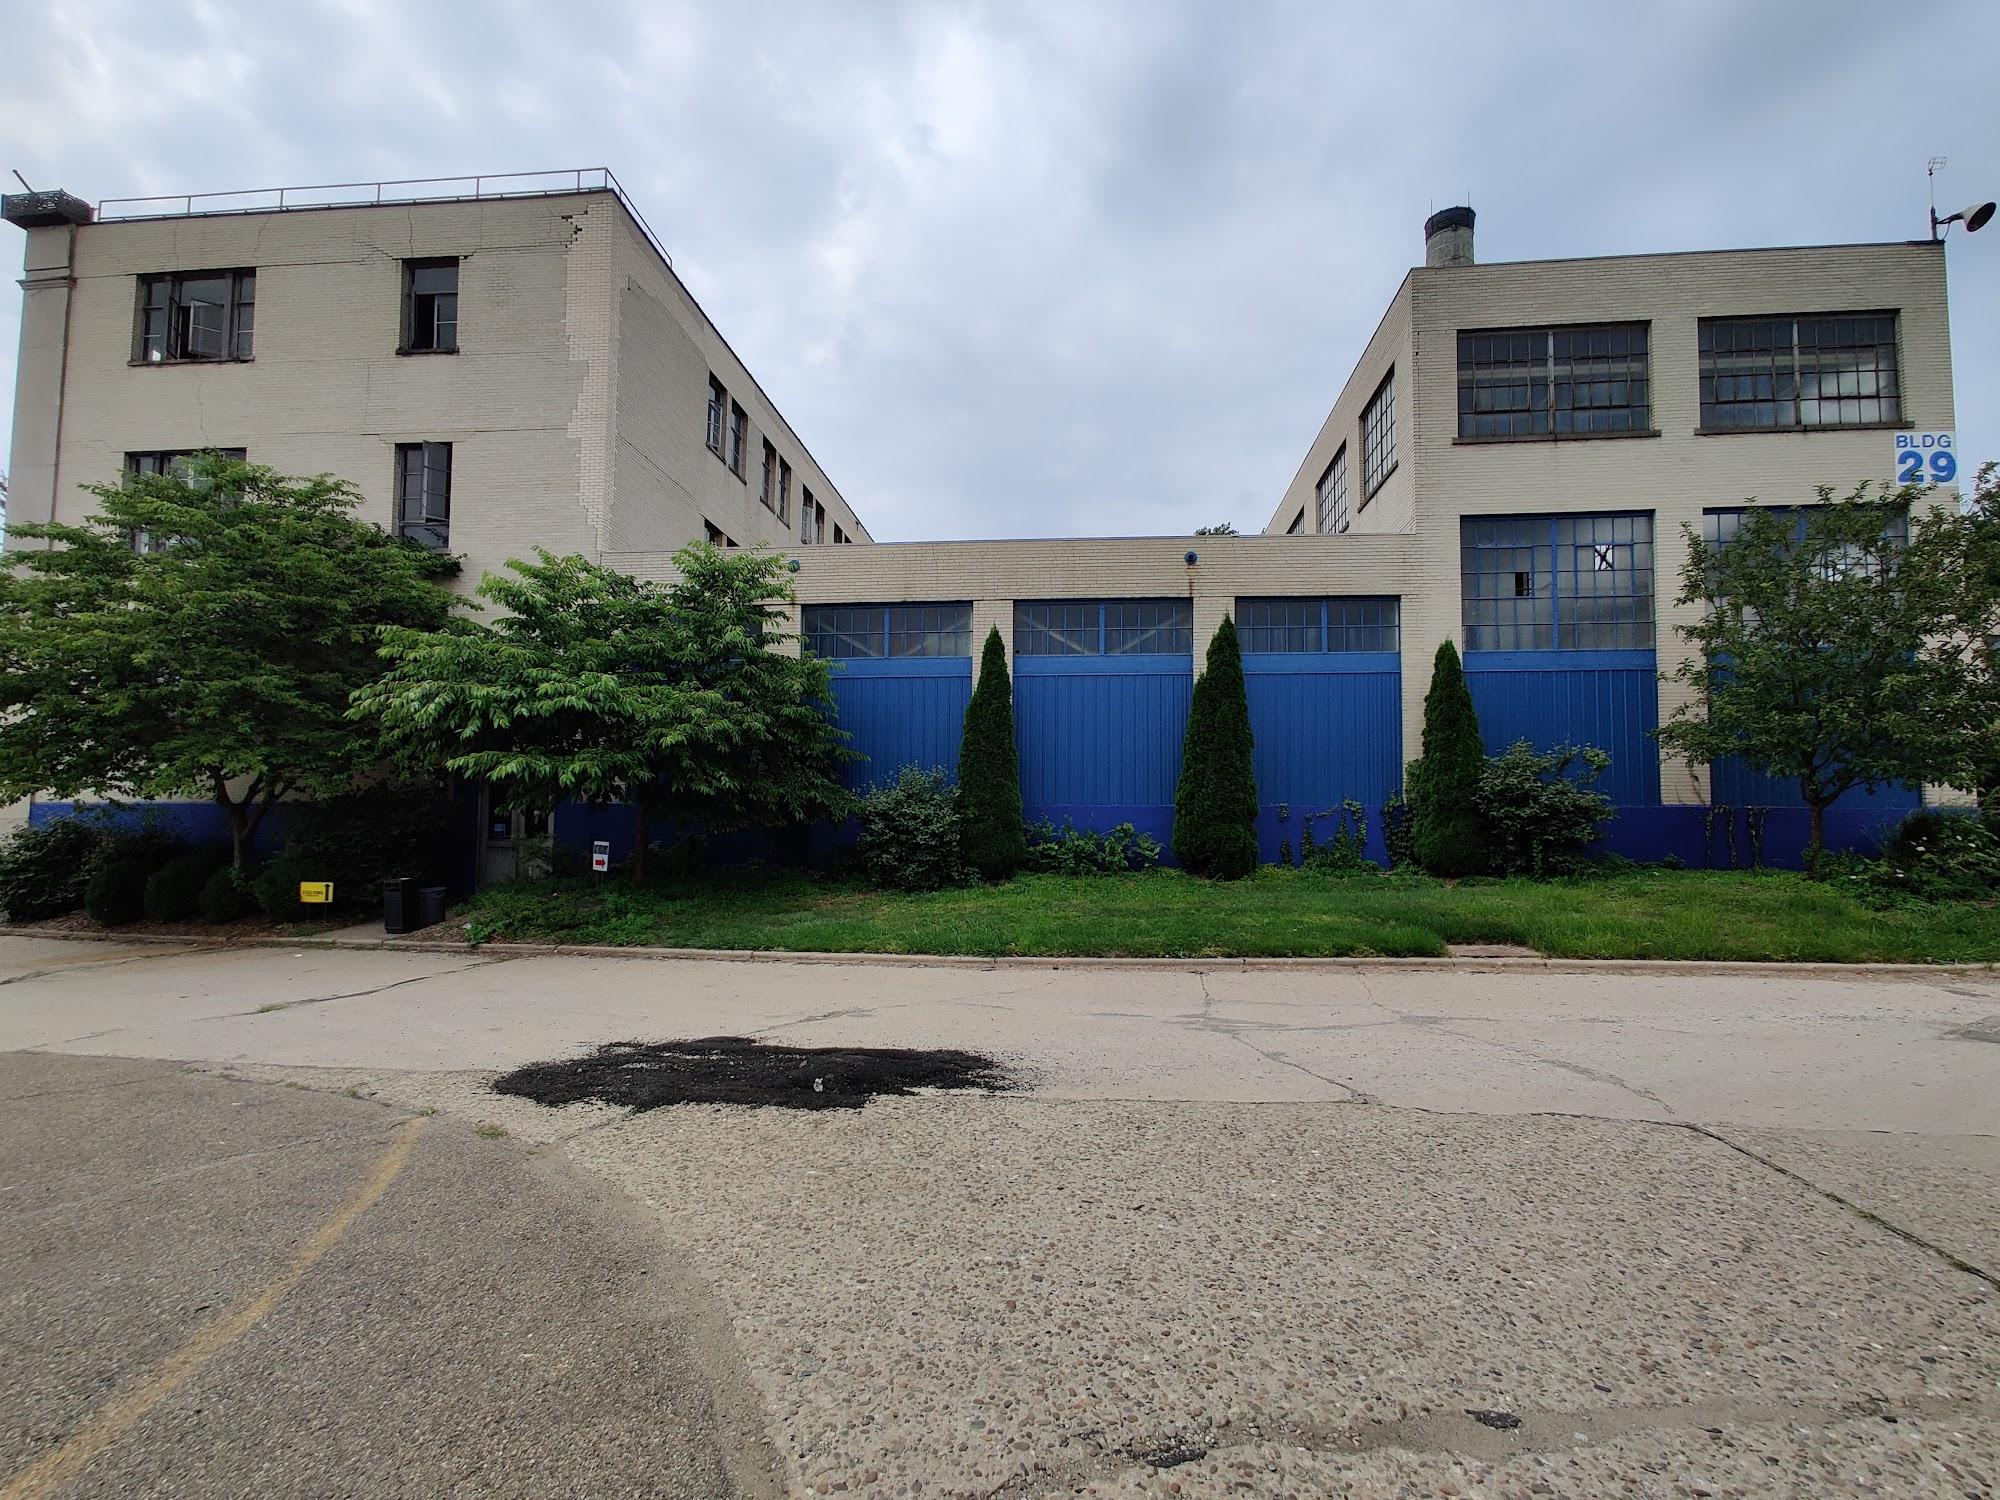 SteelTown Paintball - Indoor Facility 600 Freeport Rd Building 29, New Kensington